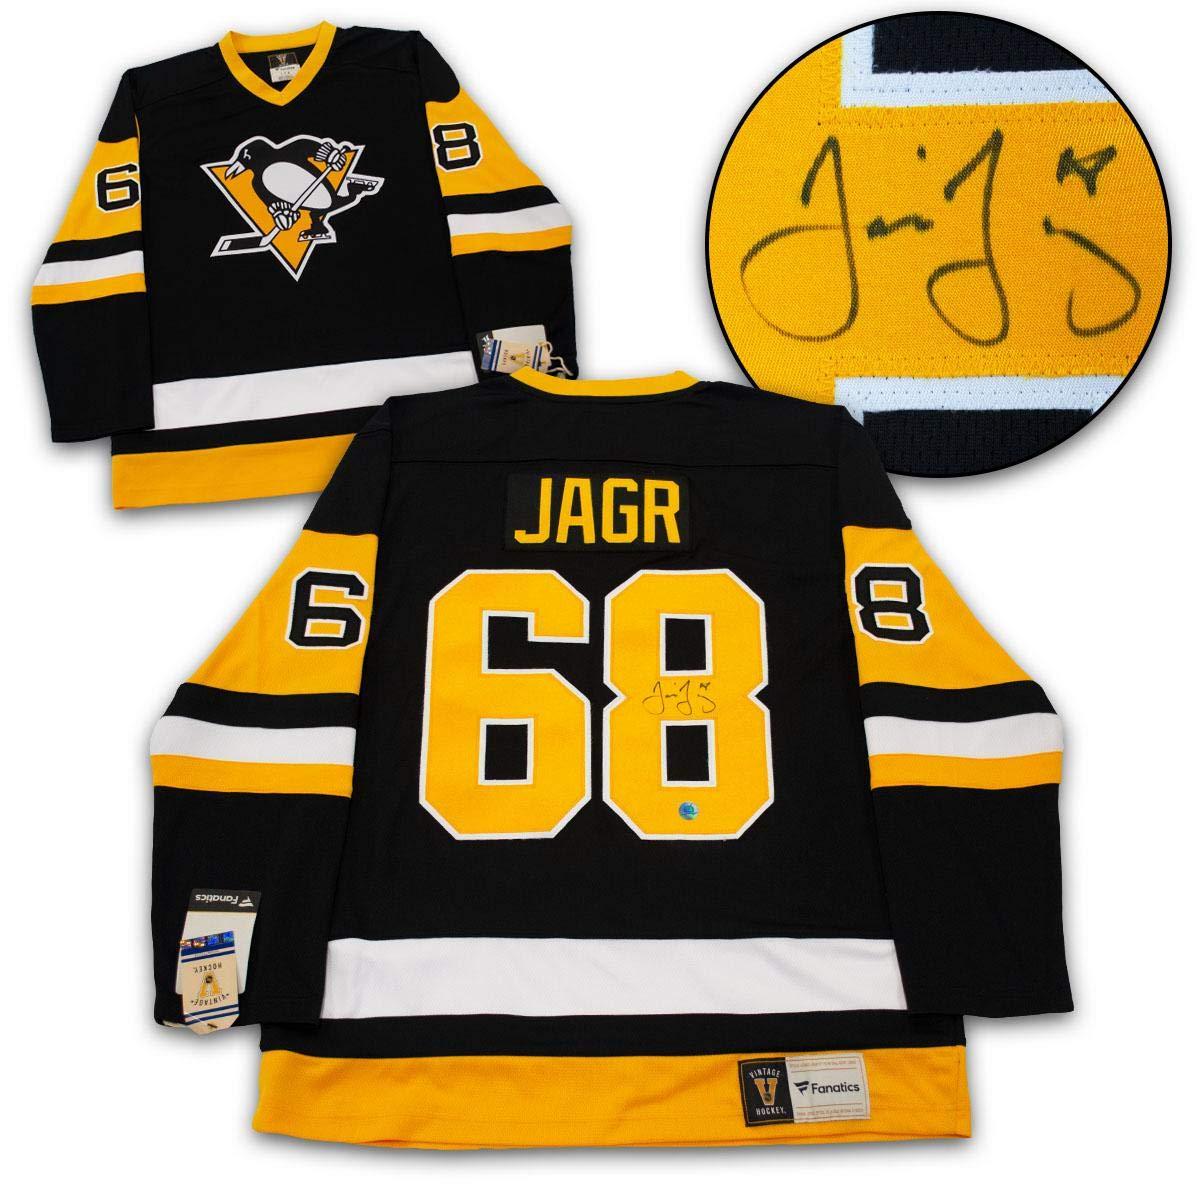 Jaromir Jagr Autographed Jersey - Fanatics Vintage - Autographed NHL Jerseys  at Amazon s Sports Collectibles Store 6e2dbc2fcac